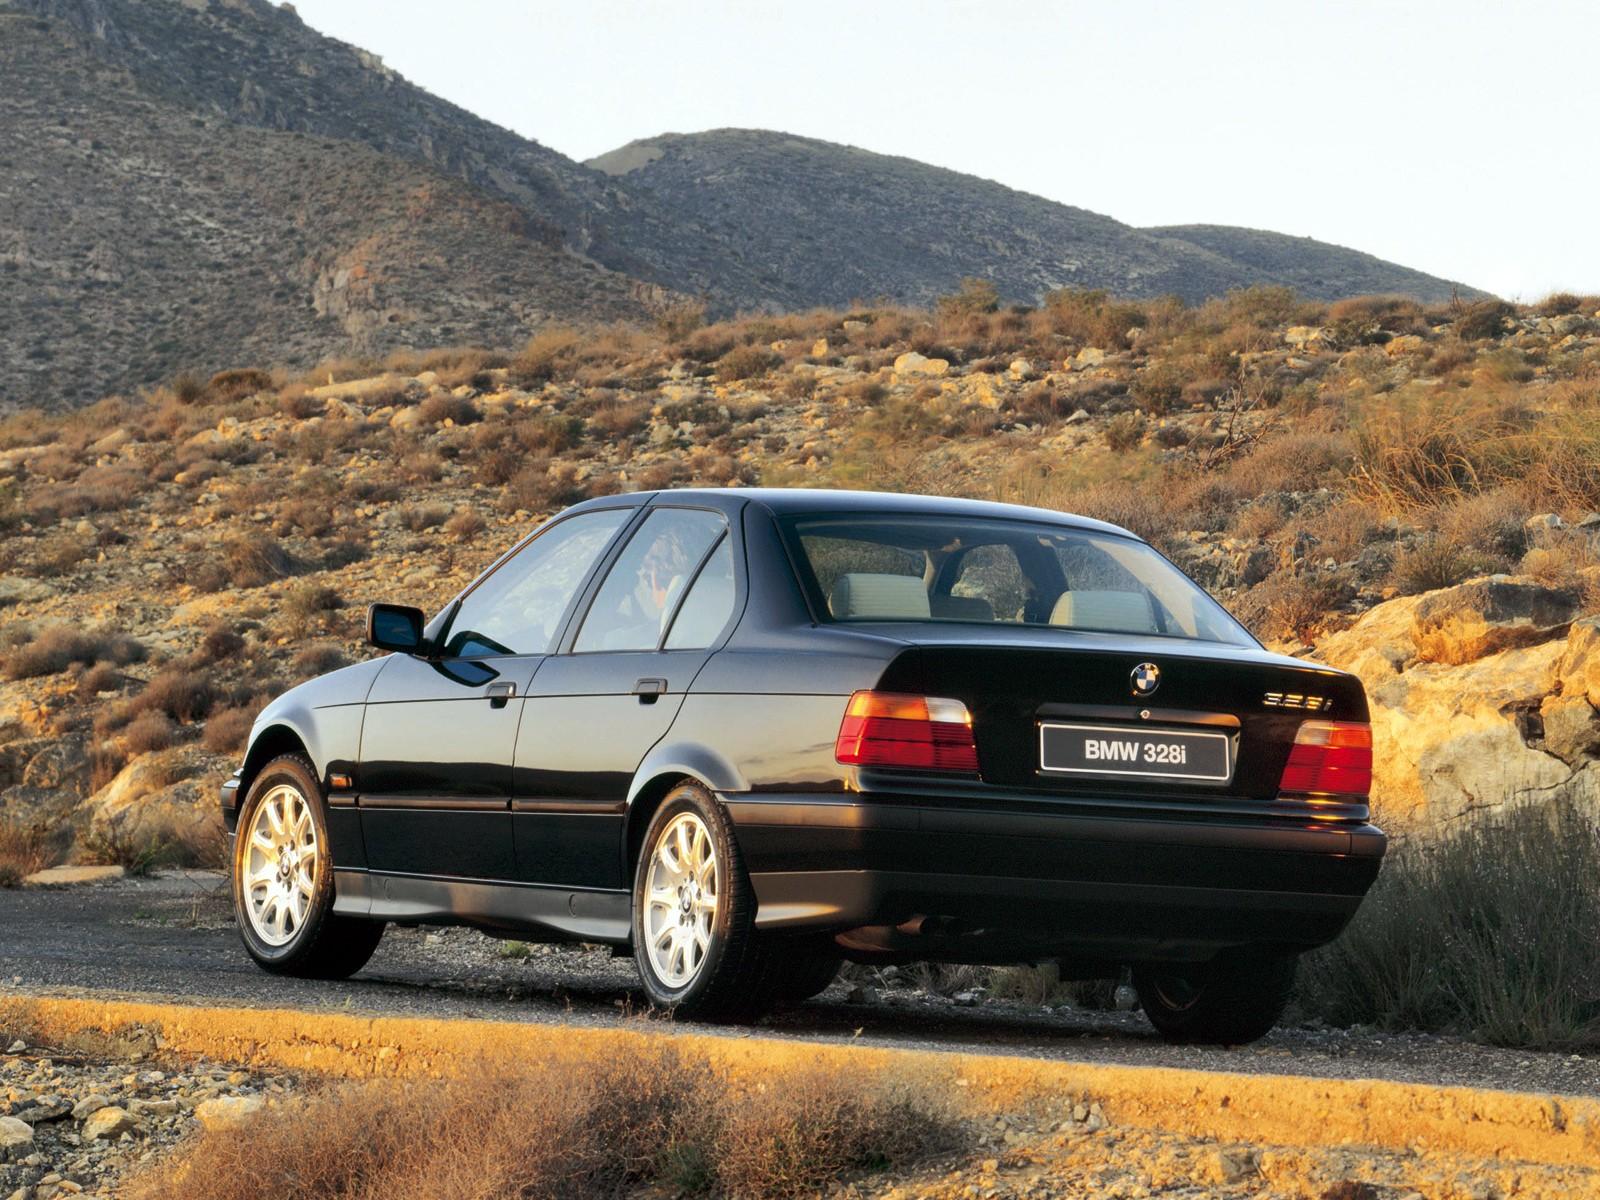 Bmw 328I 0-60 >> BMW 3 Series Sedan (E36) - 1991, 1992, 1993, 1994, 1995, 1996, 1997, 1998 - autoevolution